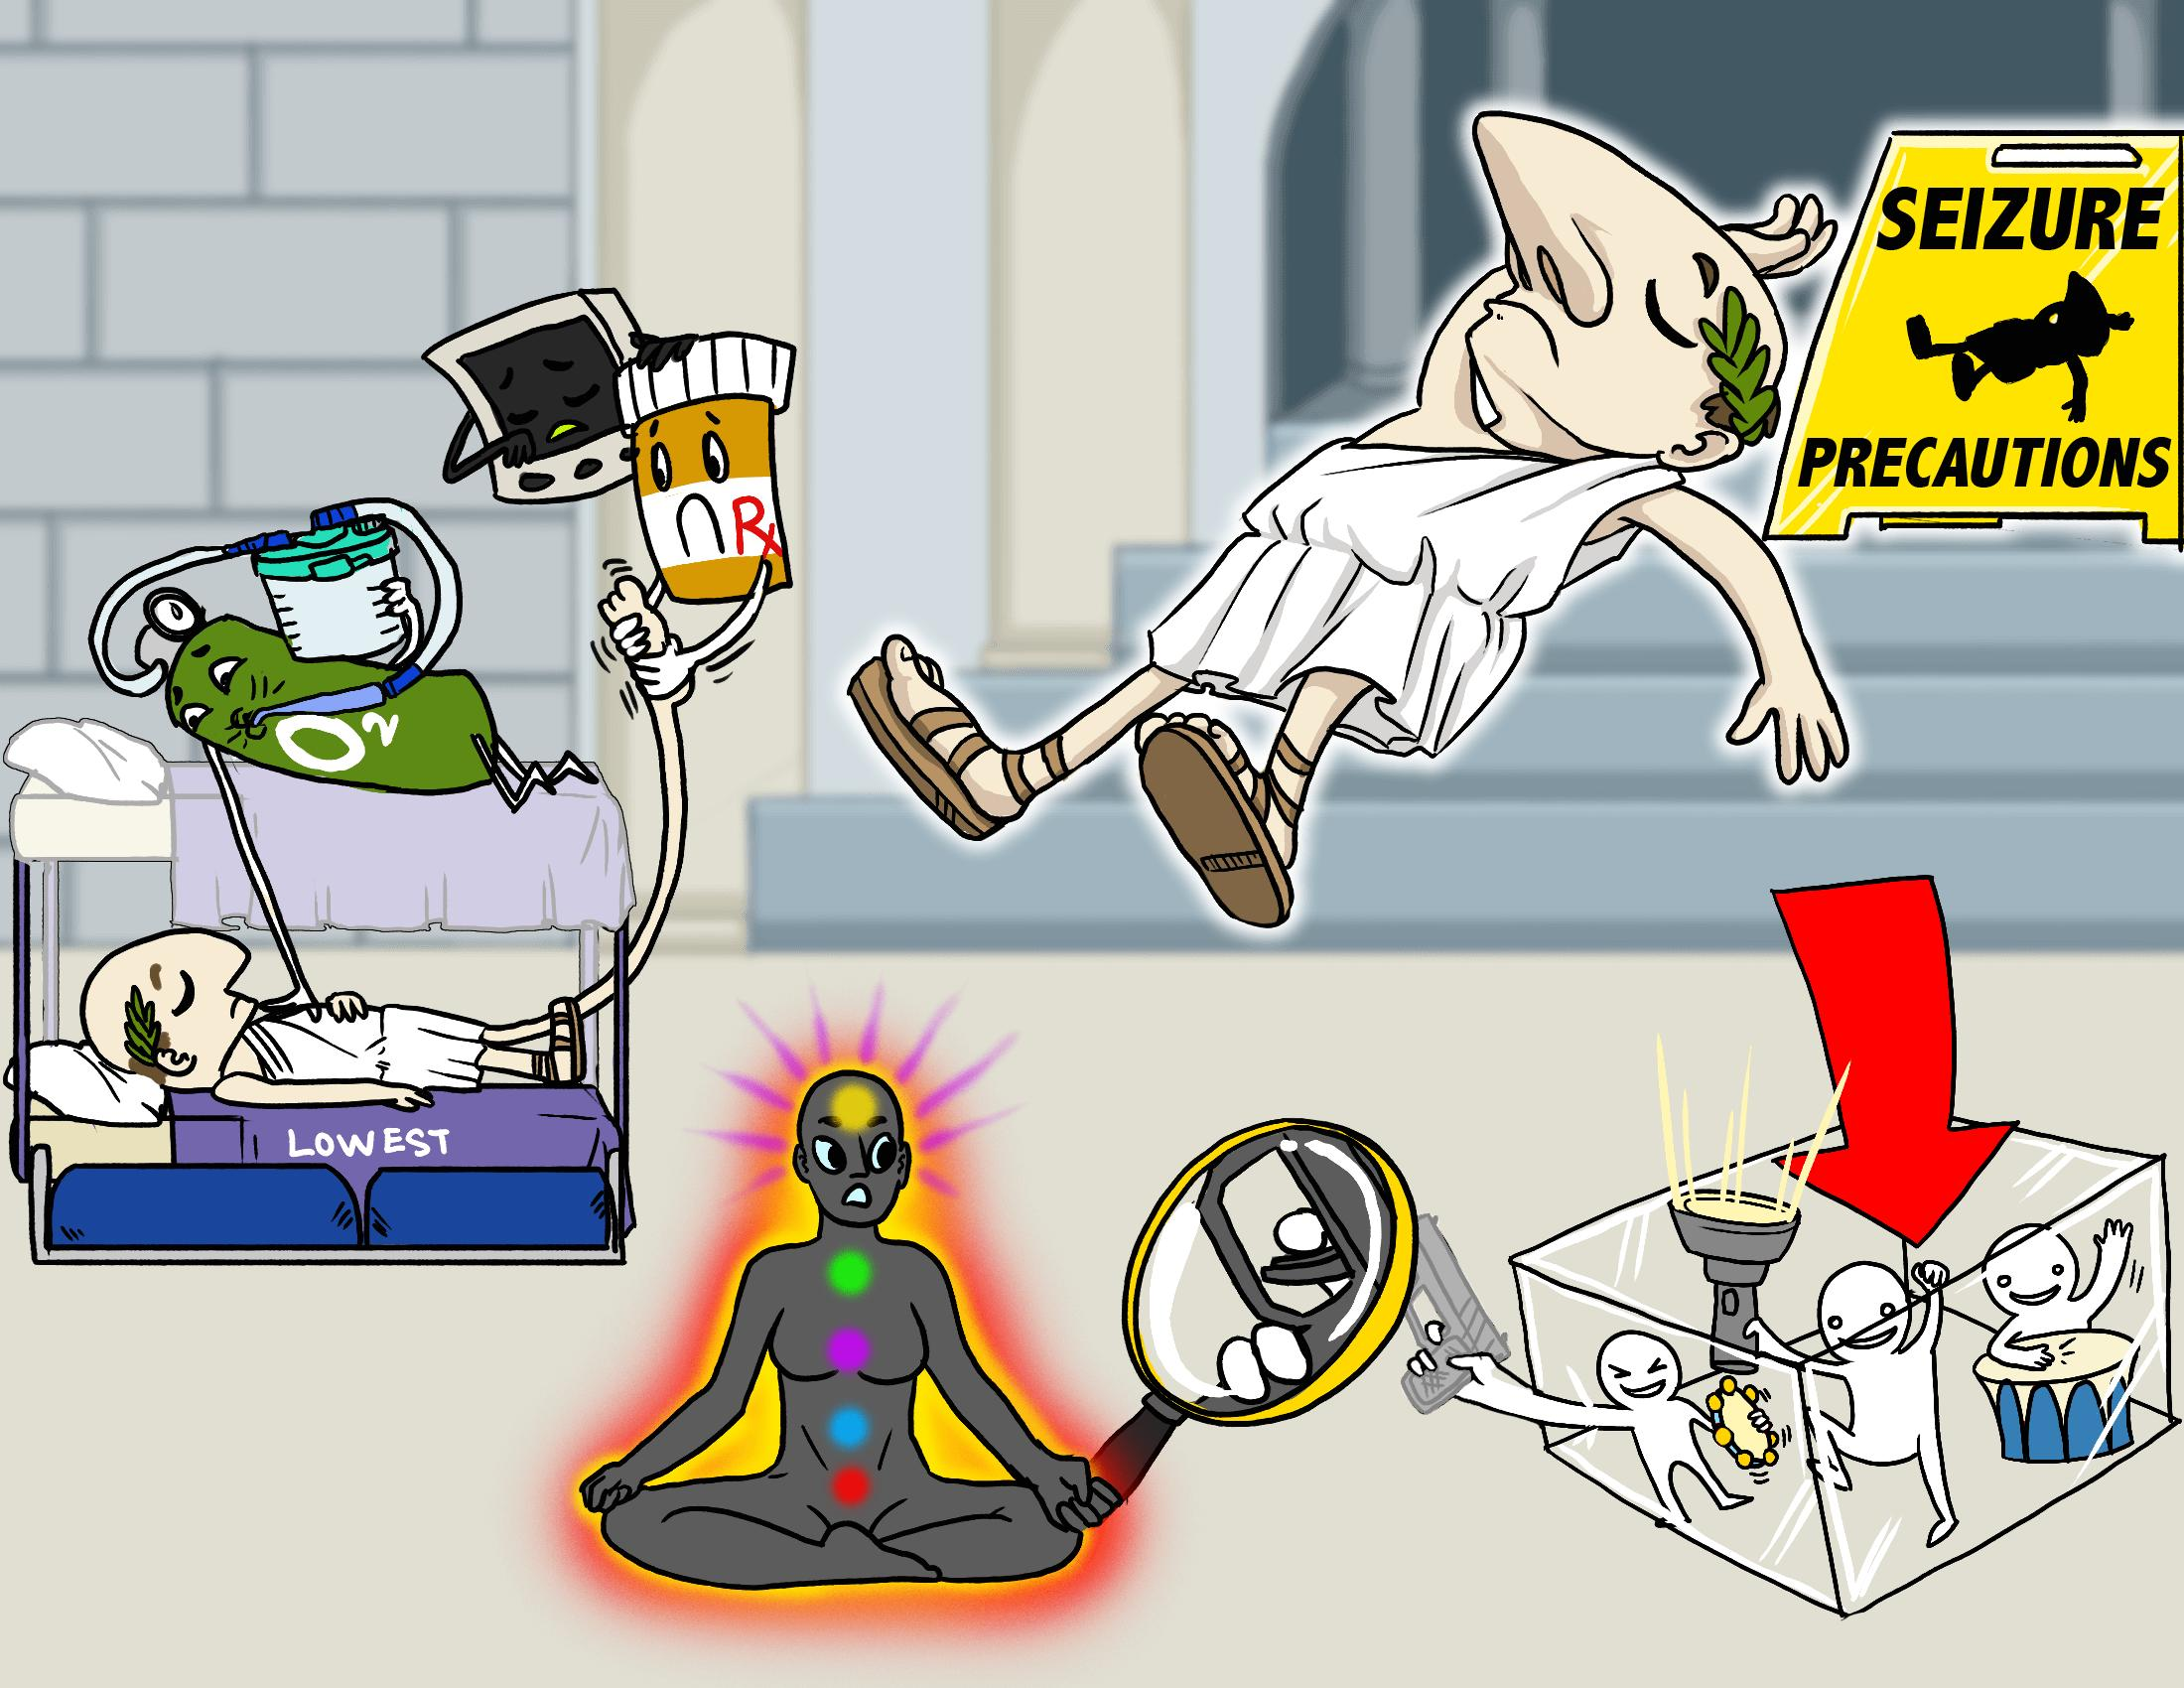 Seizure Precautions